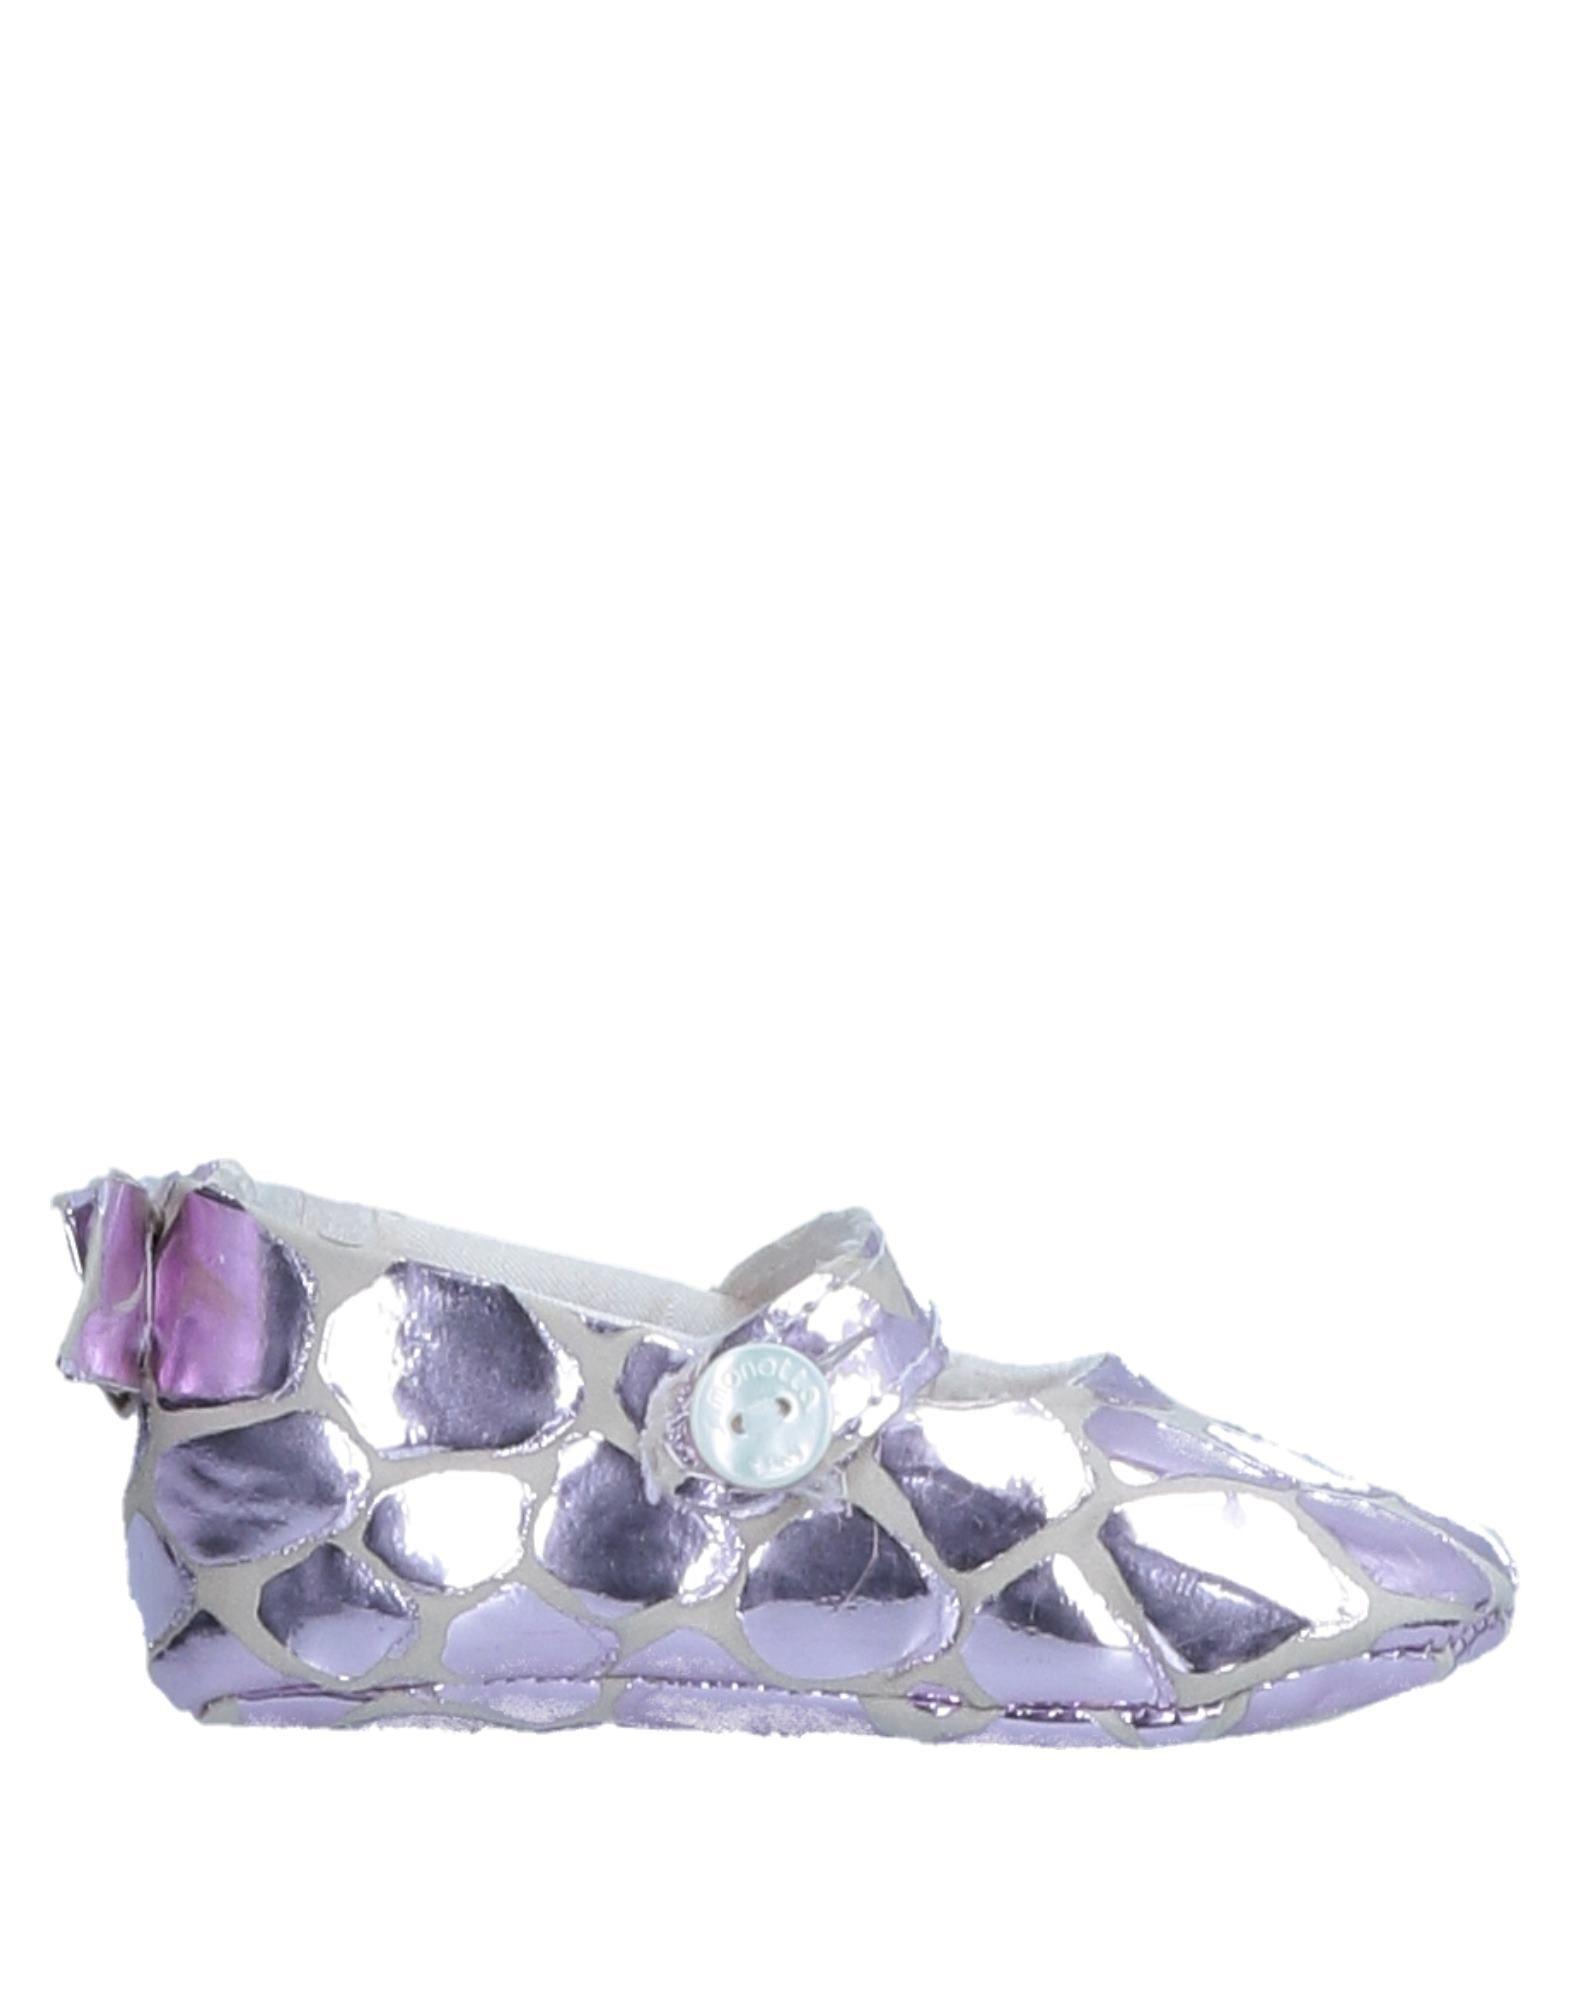 SIMONETTA TINY Обувь для новорожденных simonetta tiny поло